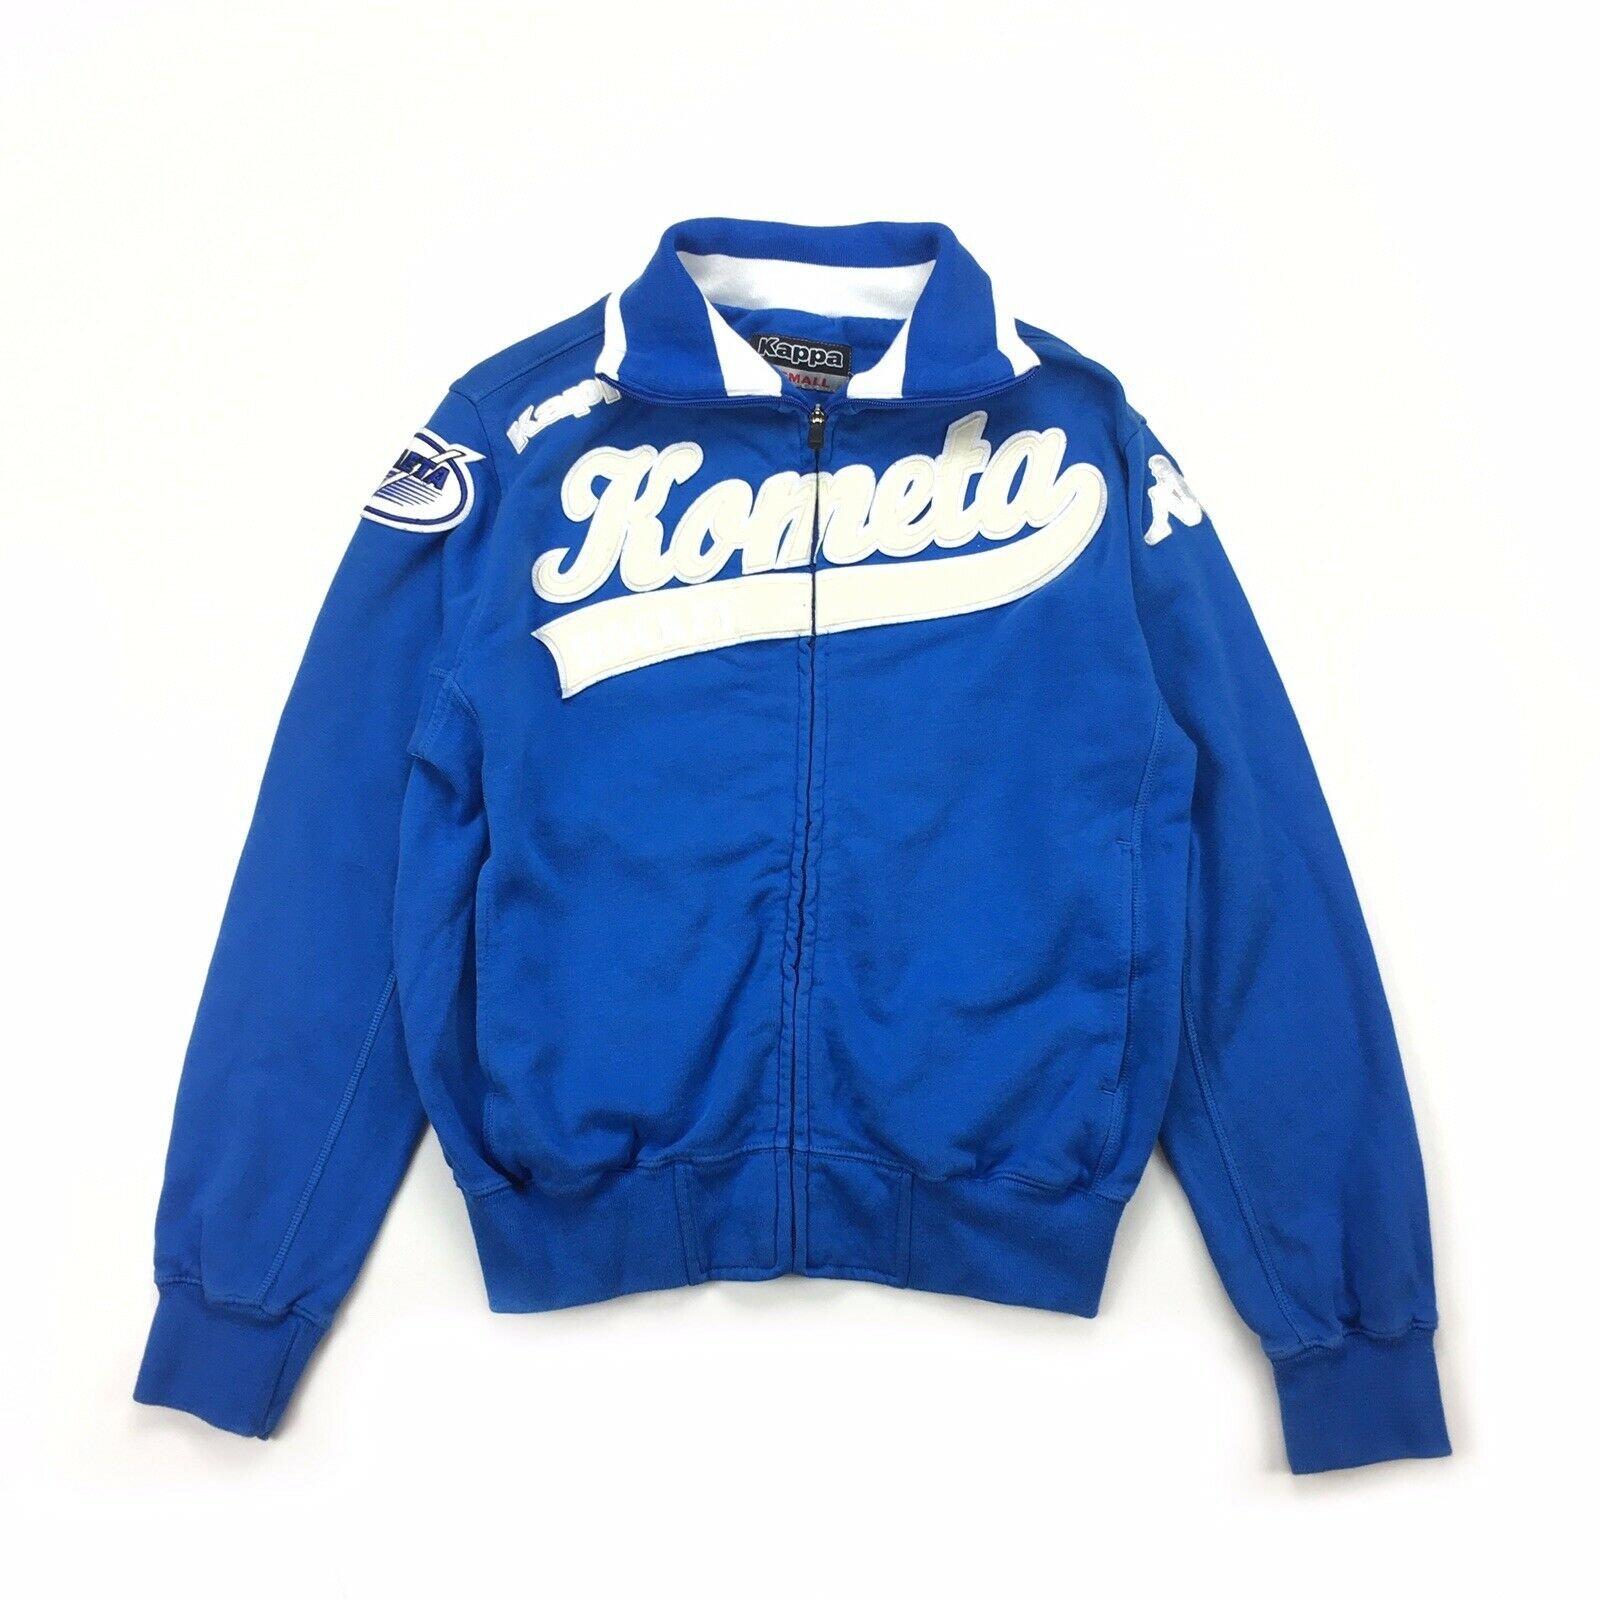 KAPPA NWT Offtrack Kometa Hockey Zip Up Sweatshirt Jacket Sz XS